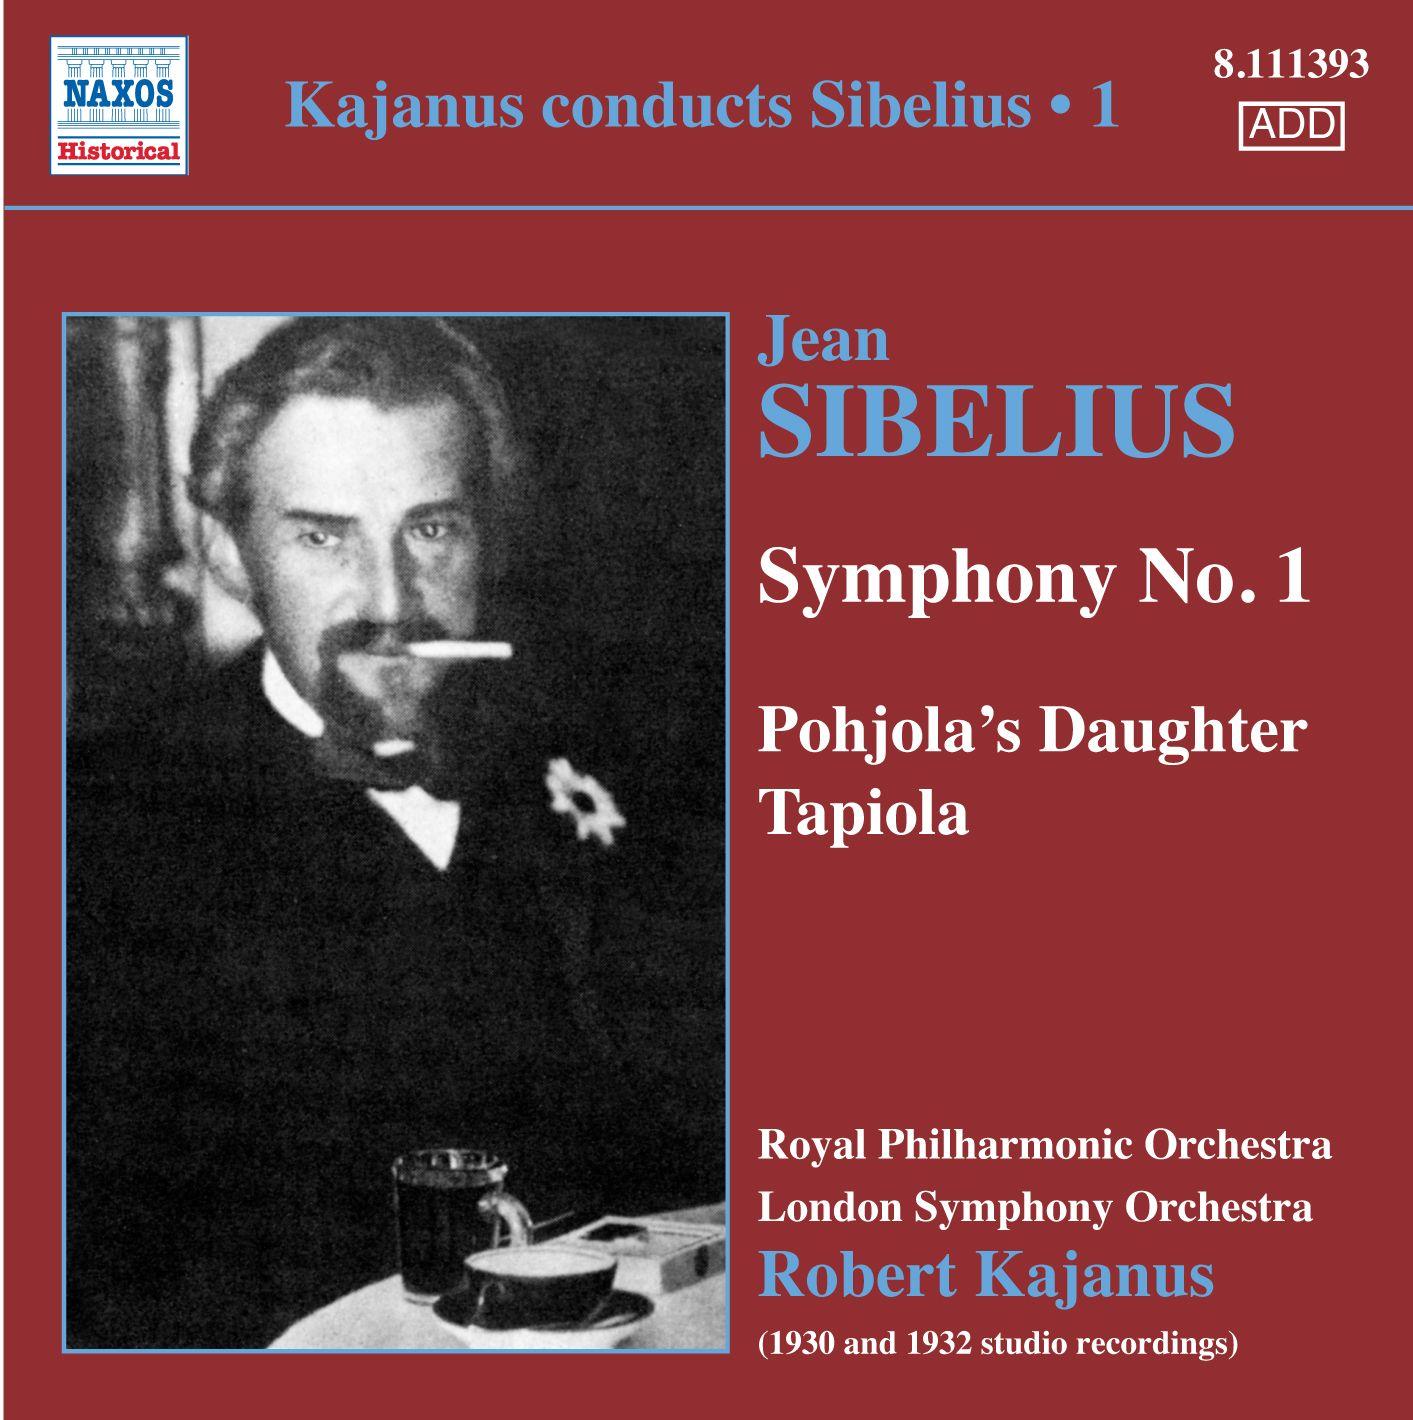 London Symphony Orchestra / Robert Kajanus // Naxos 8.111393 - Recorded 1932